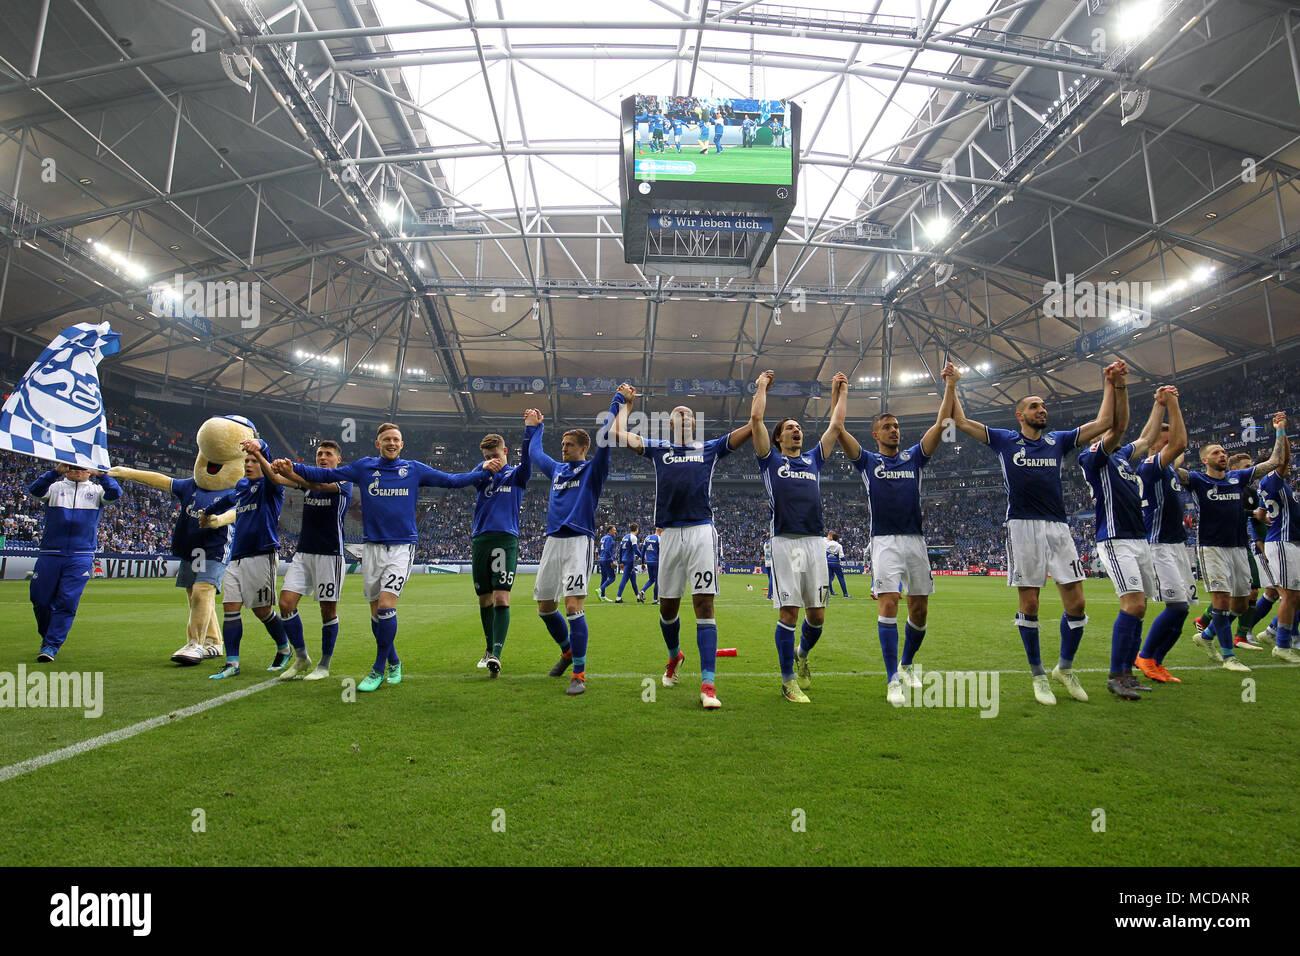 Gelsenkirchen (Germania). Xv Apr, 2018. I giocatori di FC Schalke 04 celebrare dopo aver vinto la Bundesliga match tra FC Schalke 04 e Borussia Dortmund a Gelsenkirchen, Germania, il 15 aprile 2018. Credito: Joachim Bywaletz/Xinhua/Alamy Live News Foto Stock